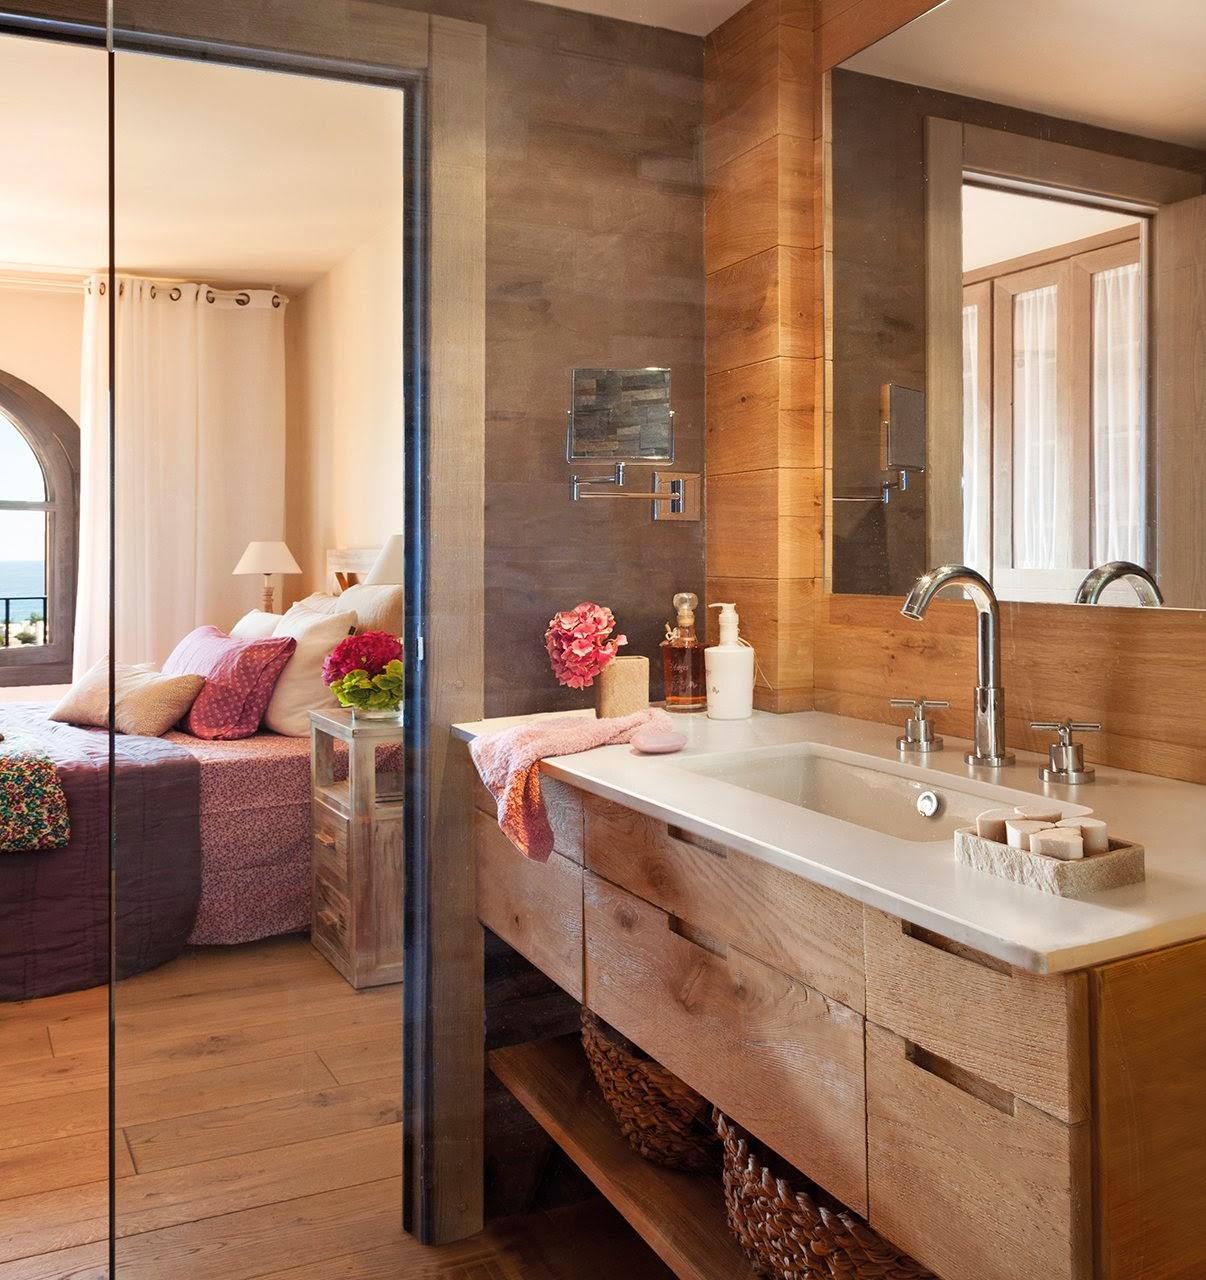 amenajari, interioare, decoratiuni, decor, design interior, casa de vacanta, culori neutre, dormitor , baie